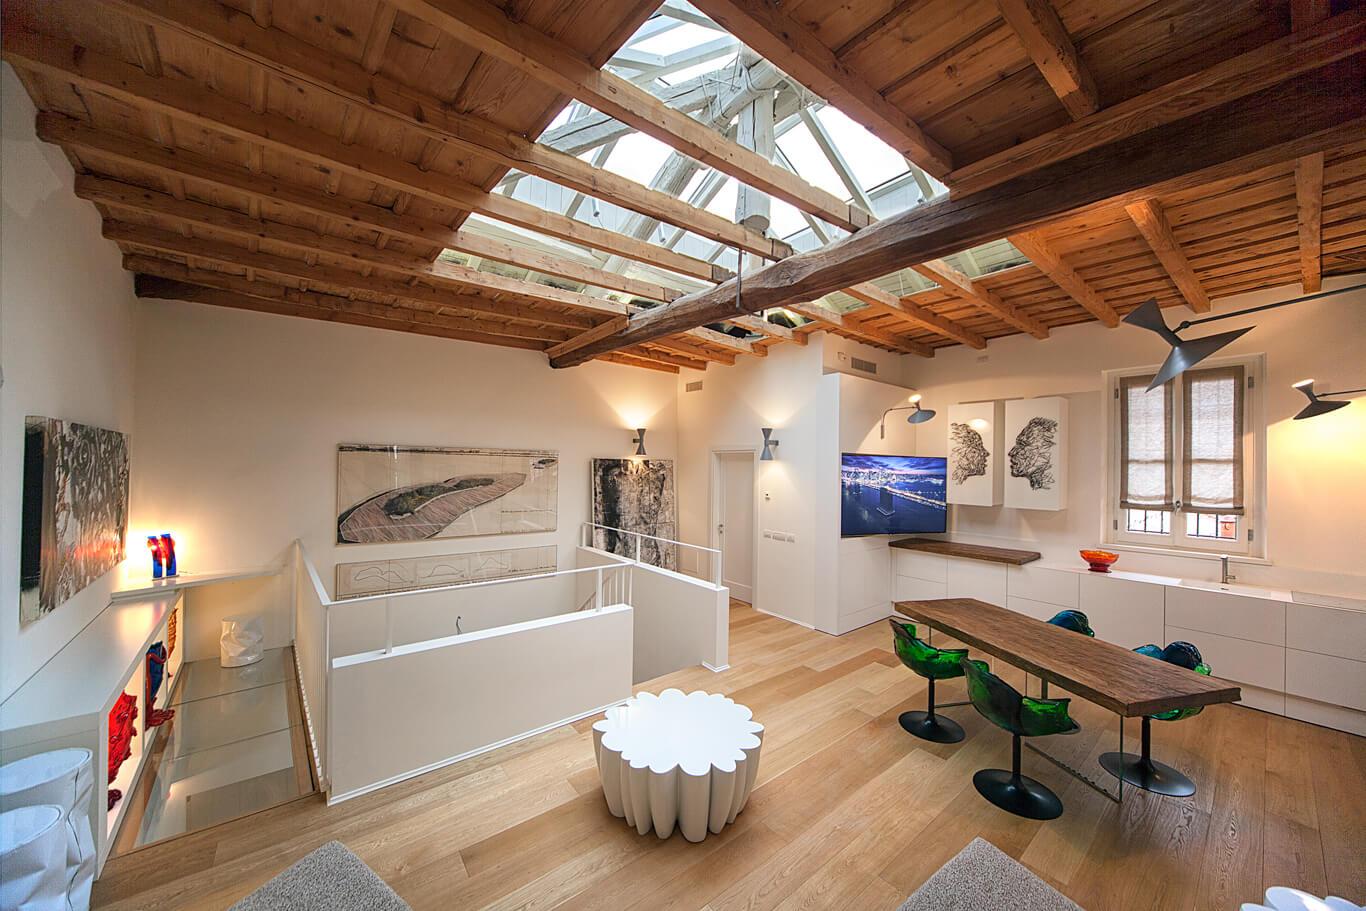 001 casa bracmarseille massimo donizelli homeadore. Black Bedroom Furniture Sets. Home Design Ideas